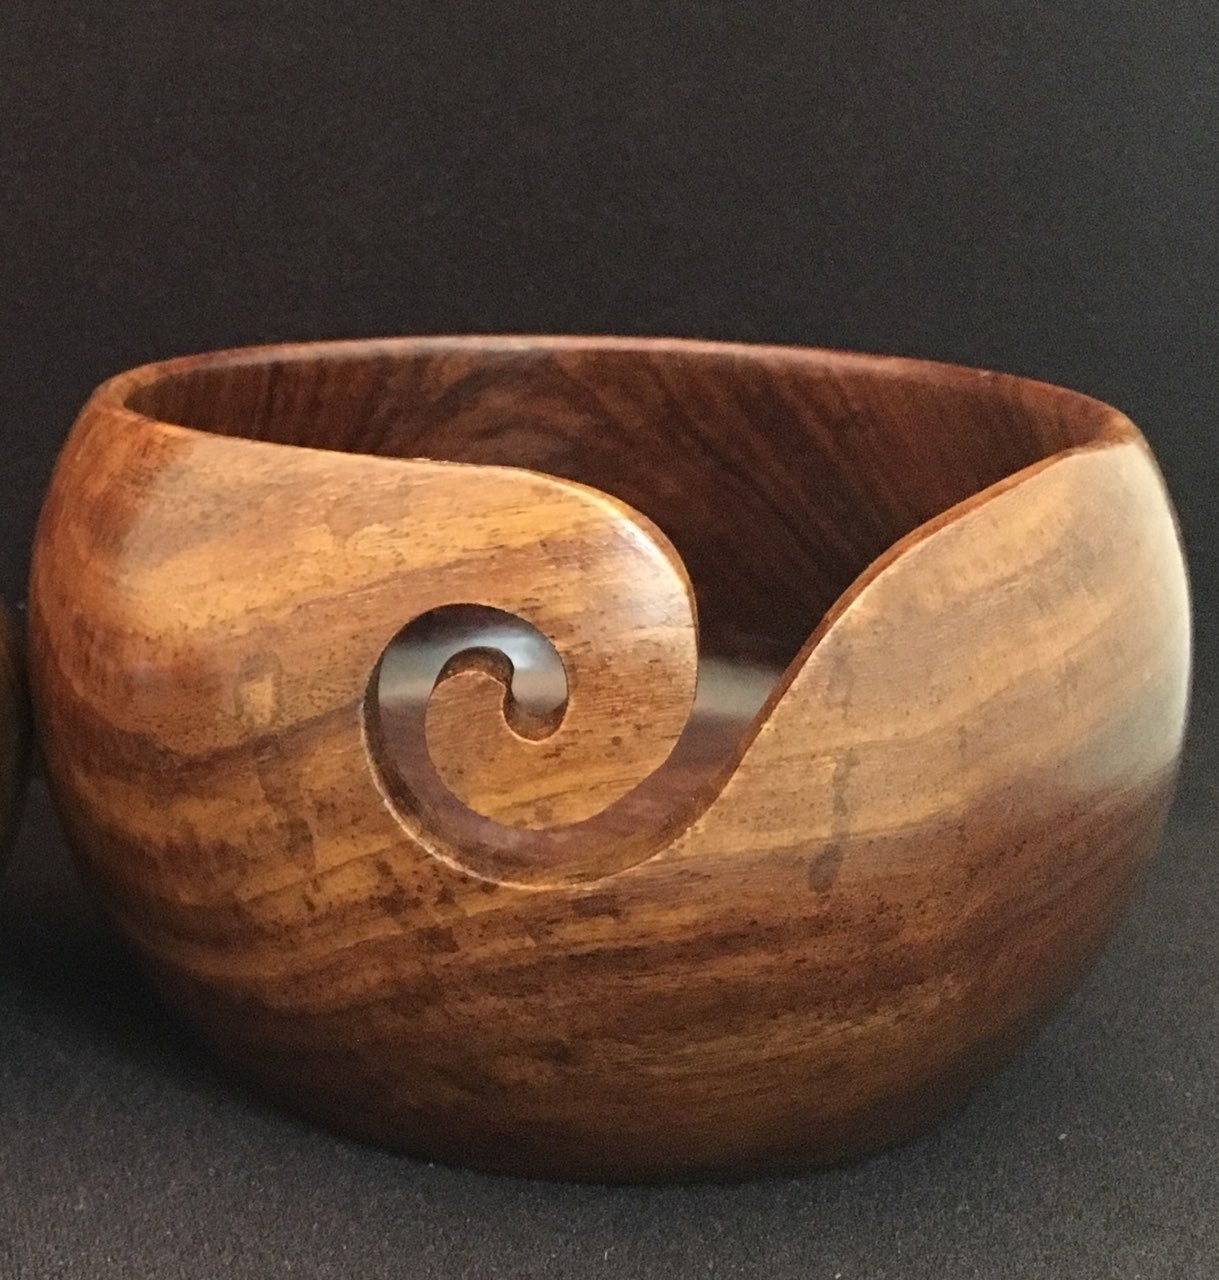 Teak Wood Yarn Bowl 6 x 3.5